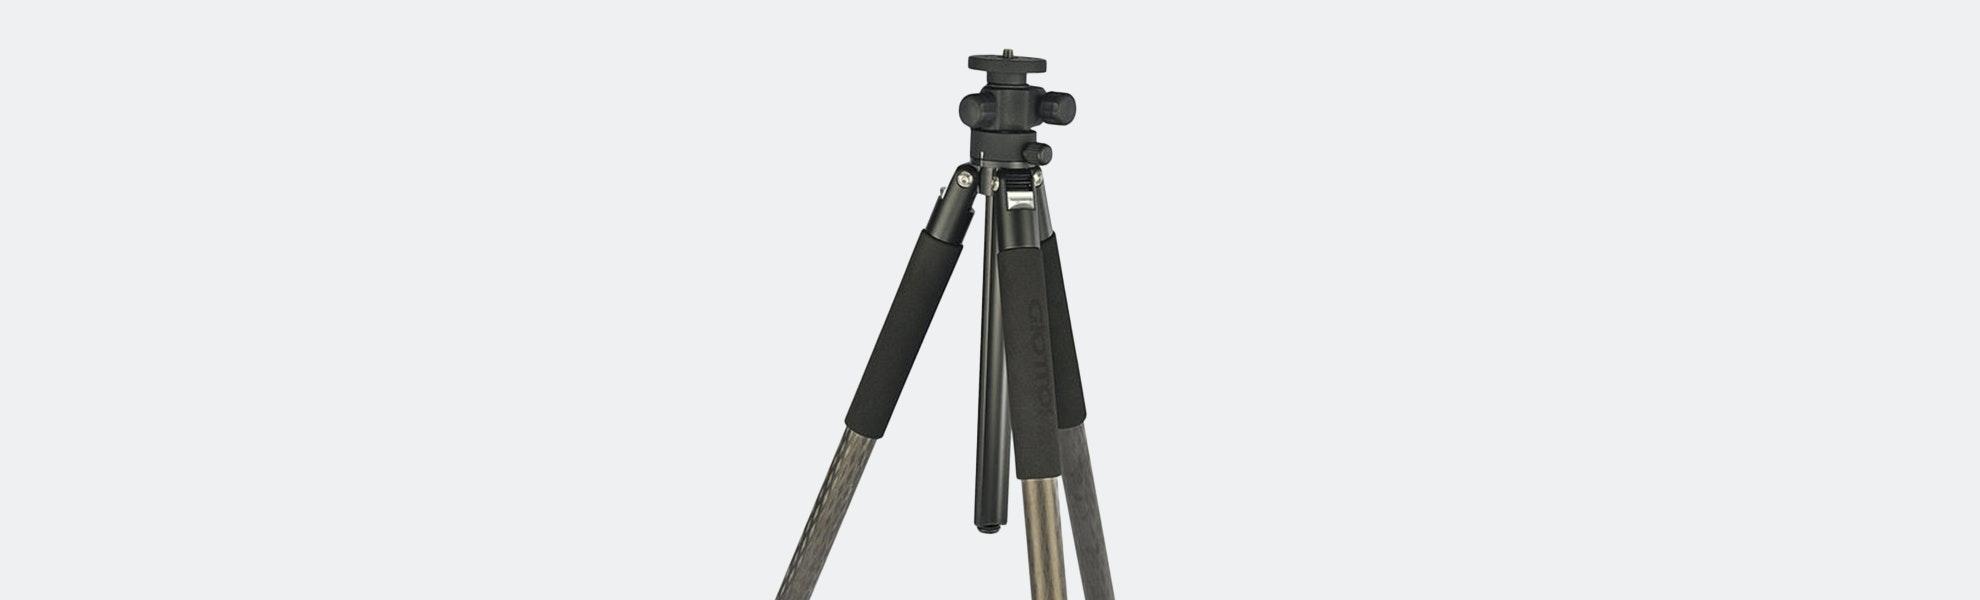 Giottos Pro Series 8383 Carbon Fiber Tripod